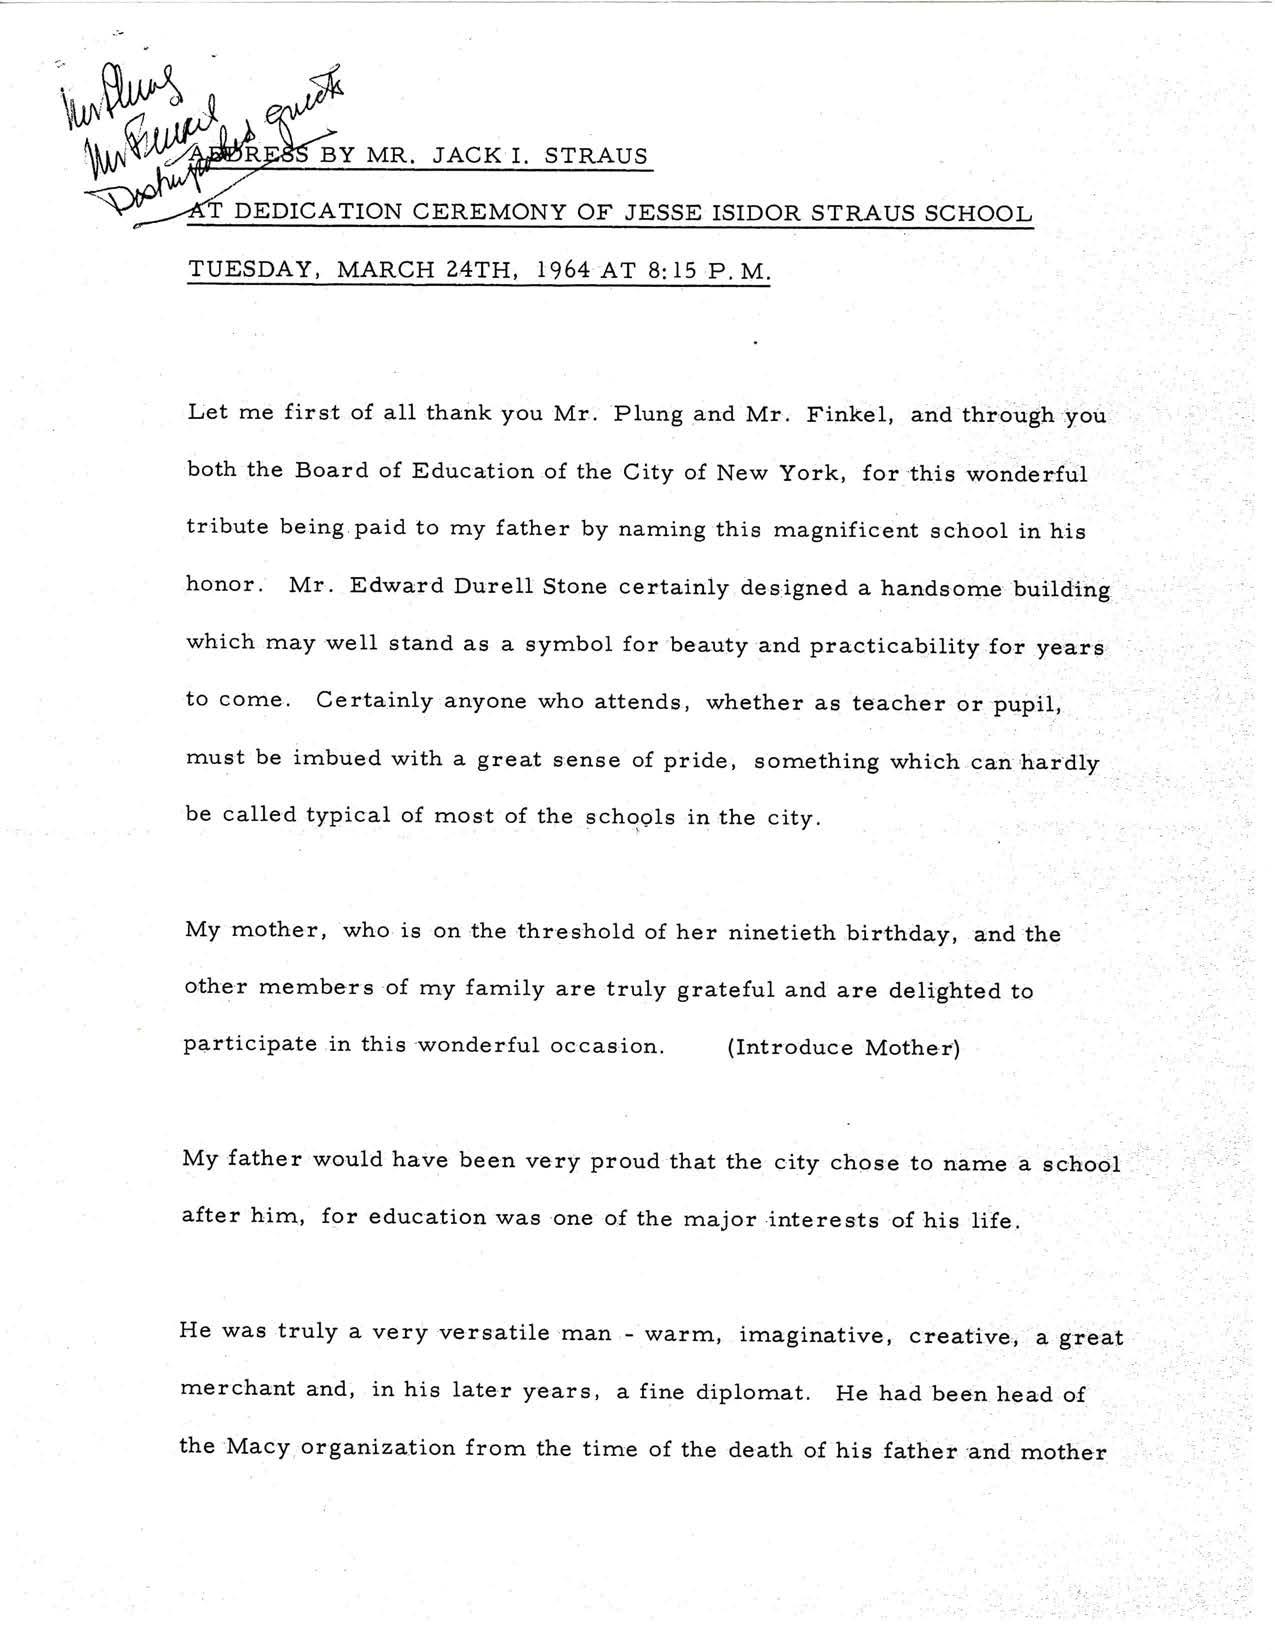 Jack I Straus Dedication Address - 24 March 1964